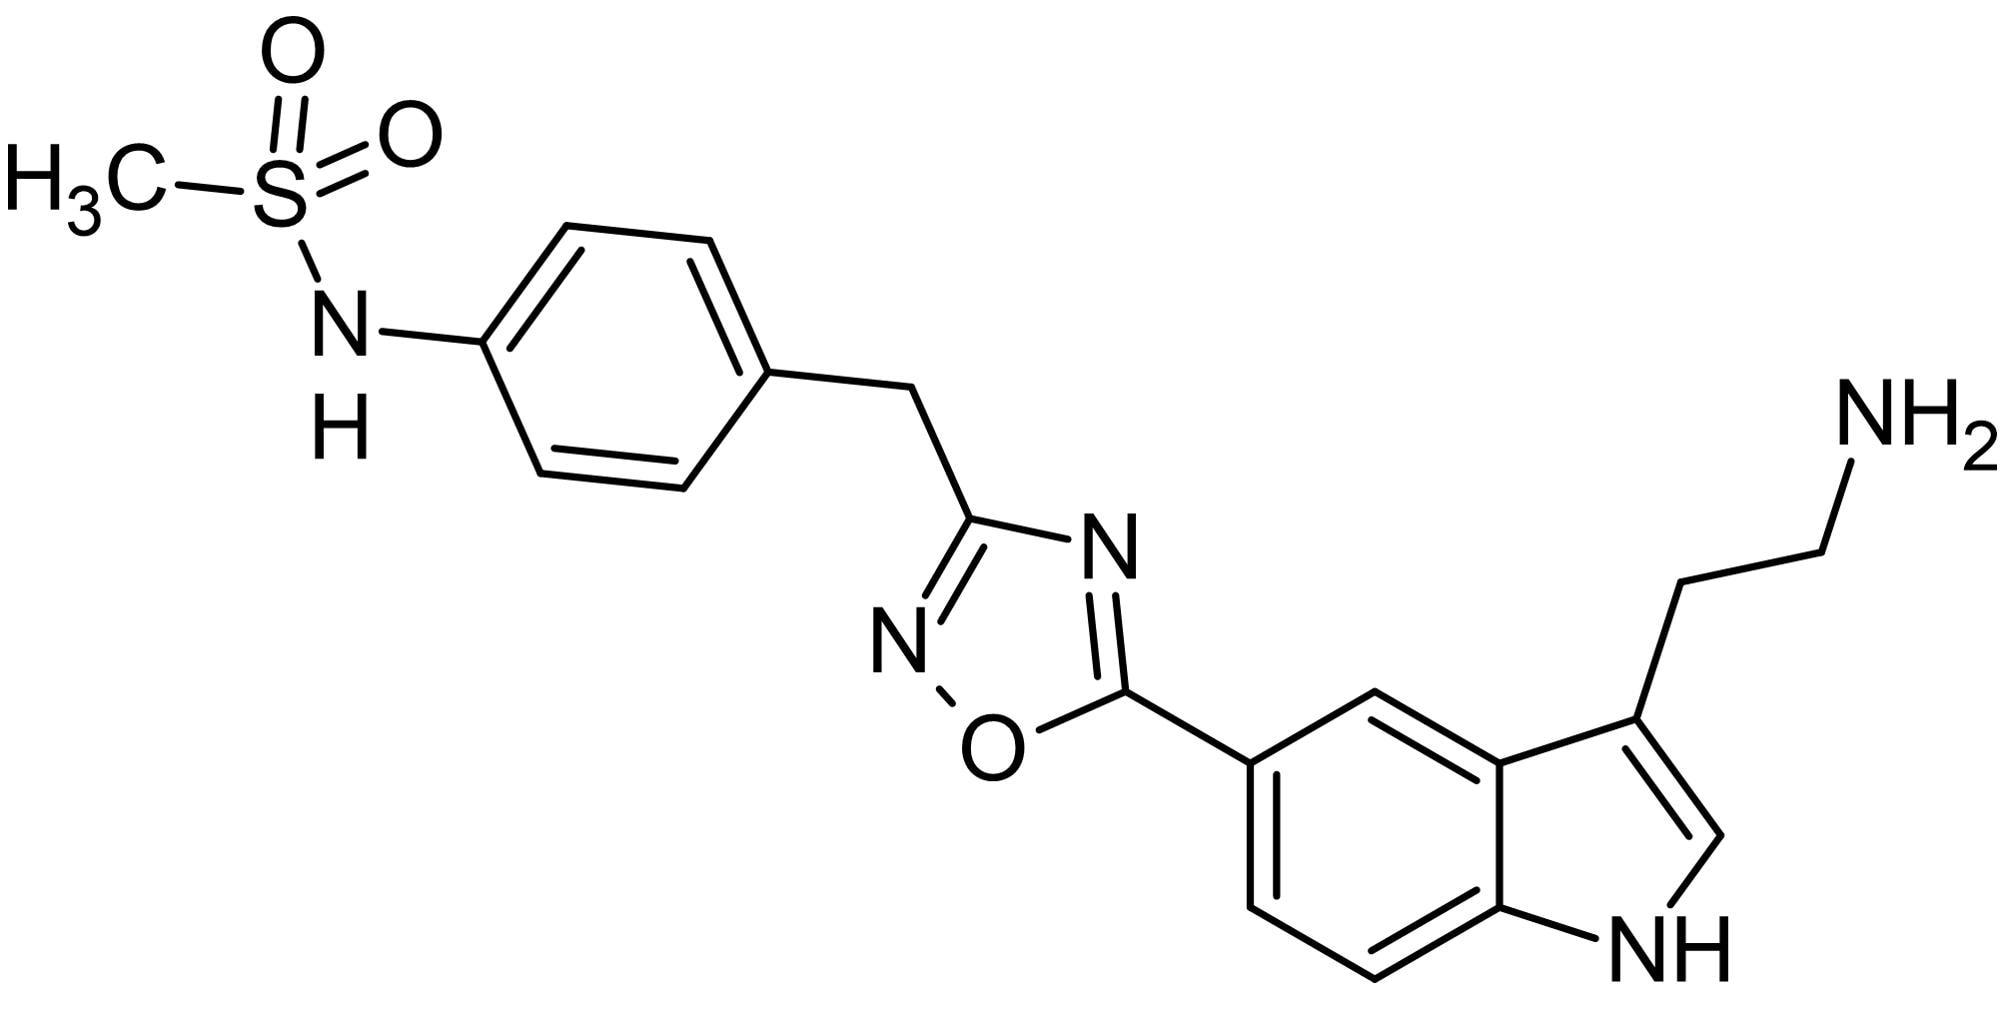 Chemical Structure - L-694,247, 5-HT<sub>1D</sub>/5-HT<sub>1B</sub> receptor agonist (ab120515)